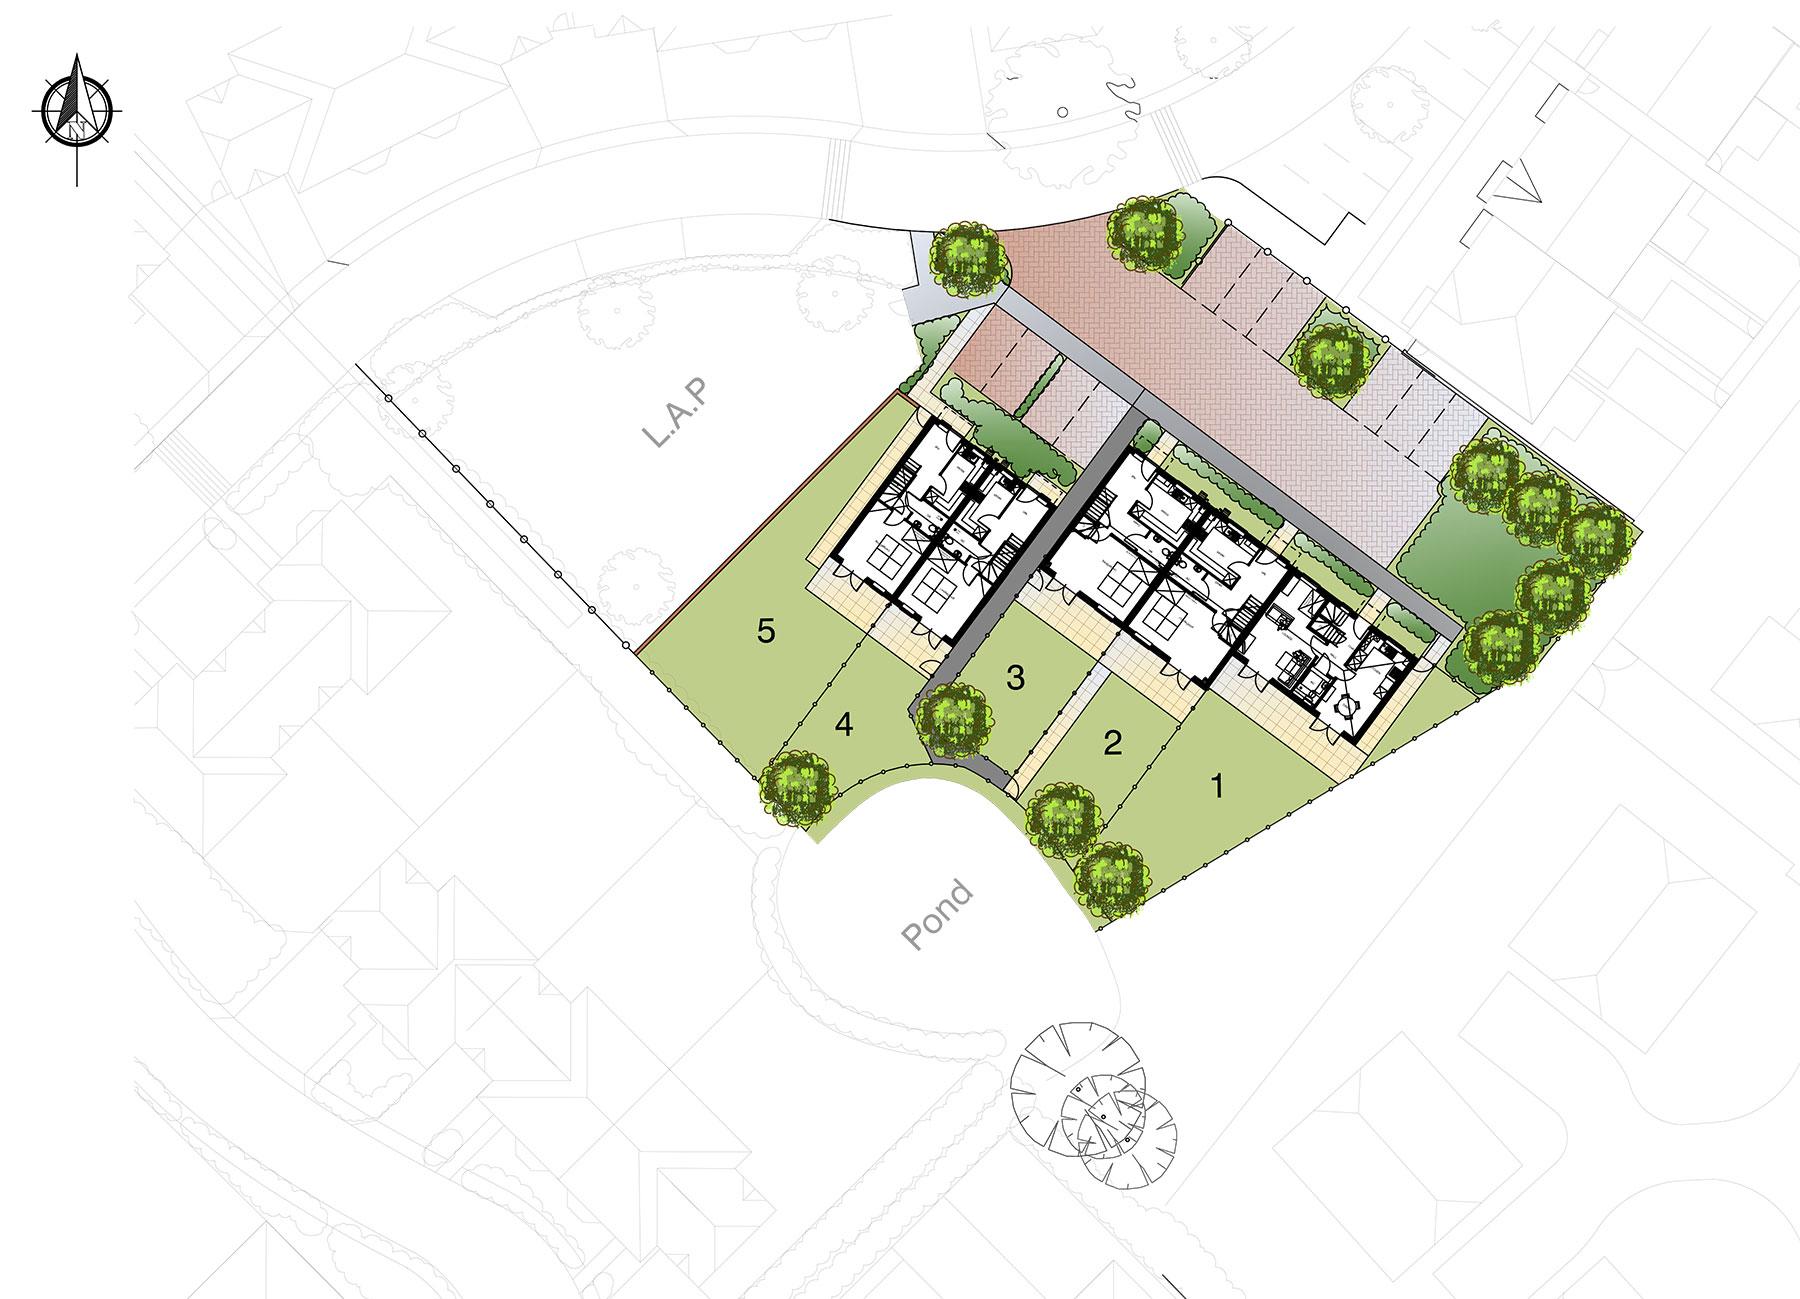 Sutton Valence, Greensand Meadow siteplan